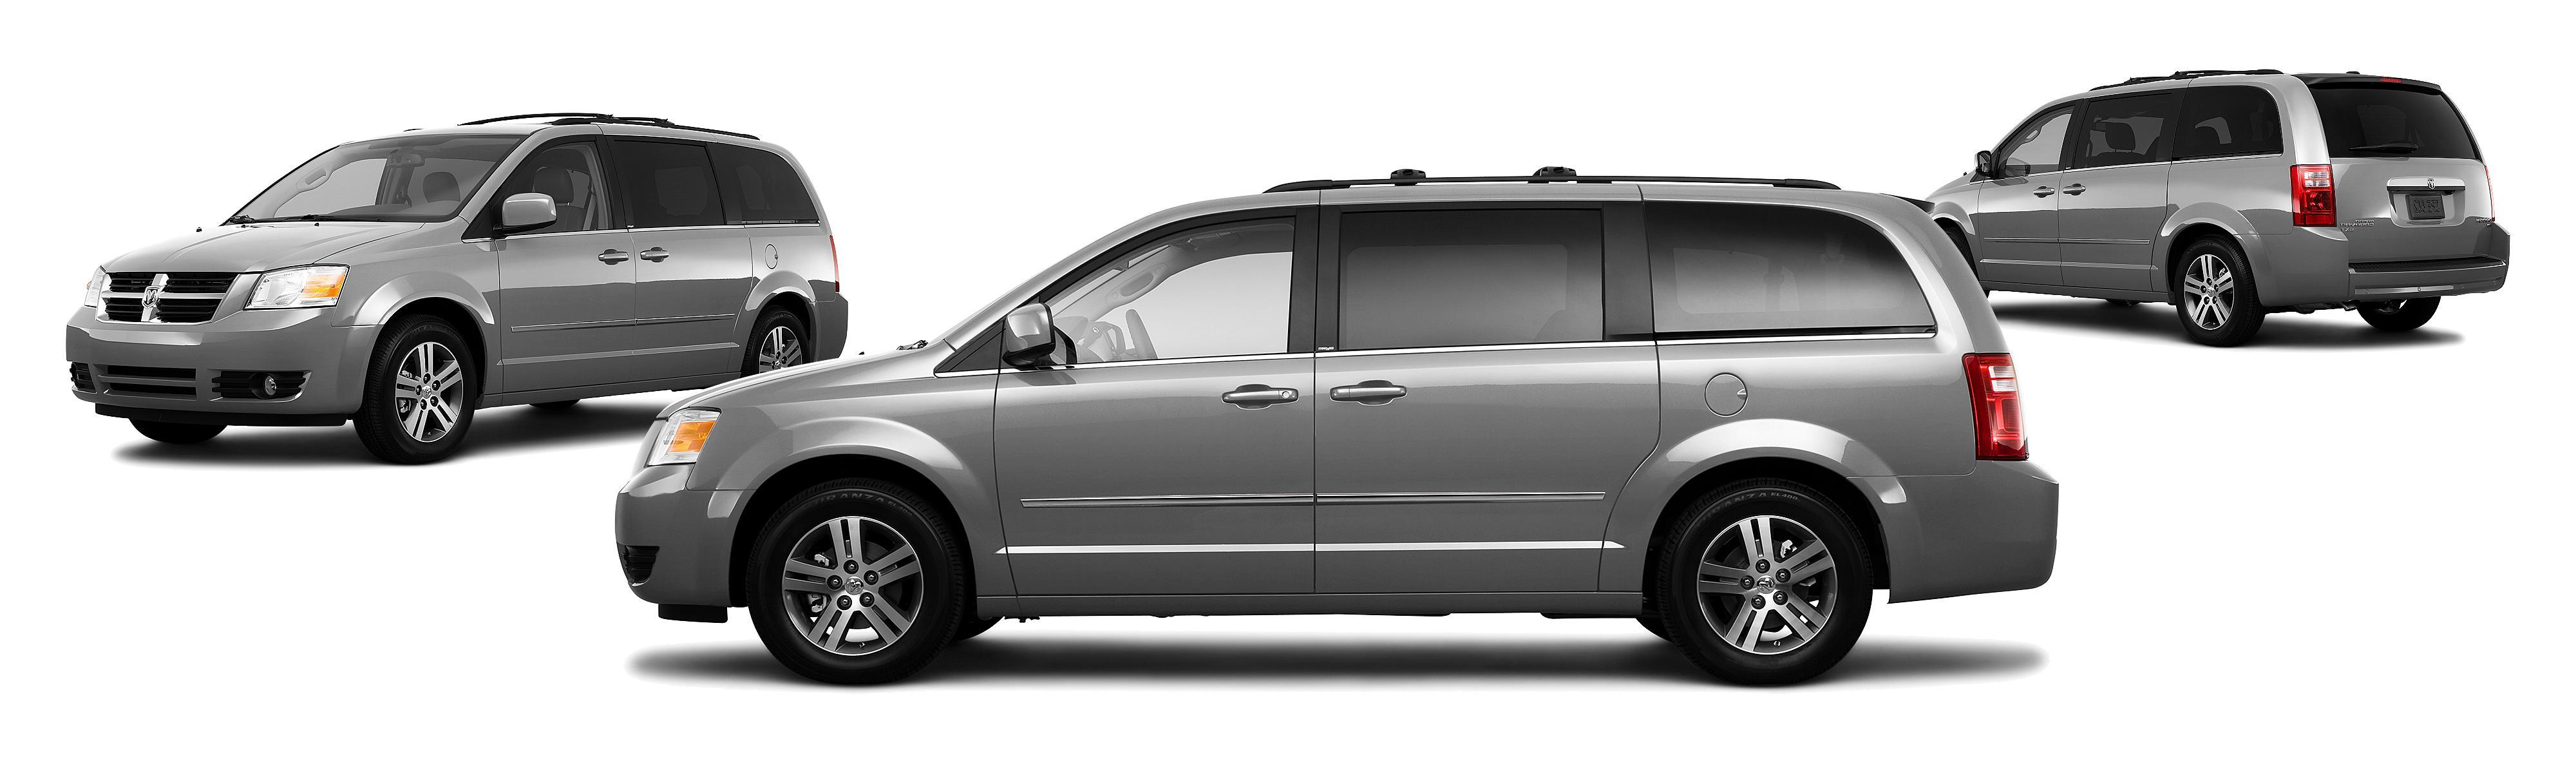 2010 dodge grand caravan sxt 4dr mini-van - research - groovecar